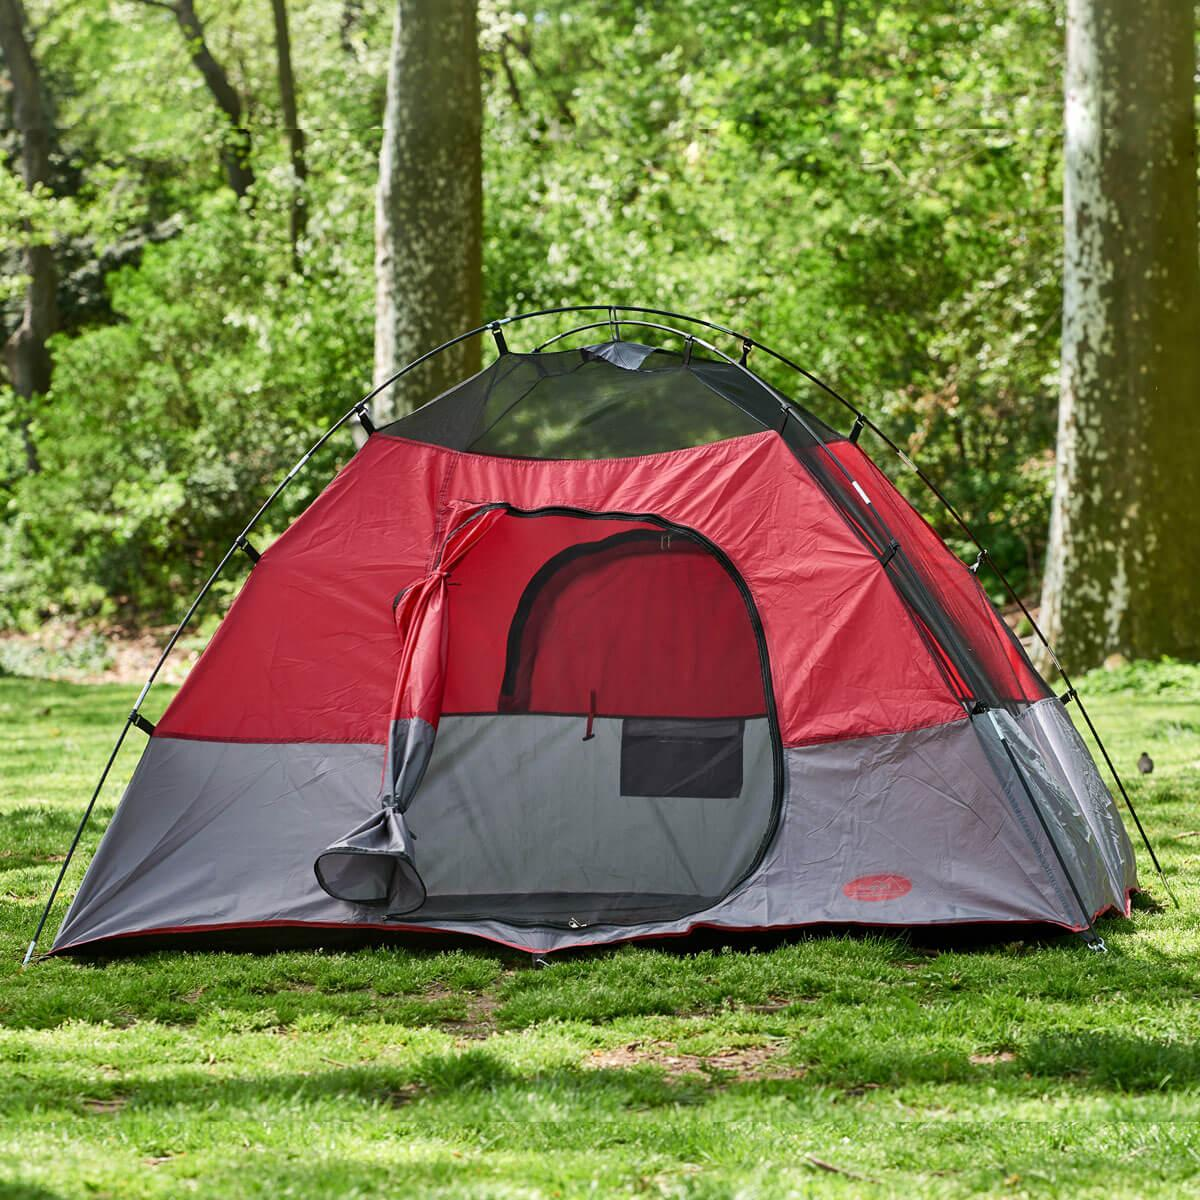 Texsport 3-Person Dome Tent